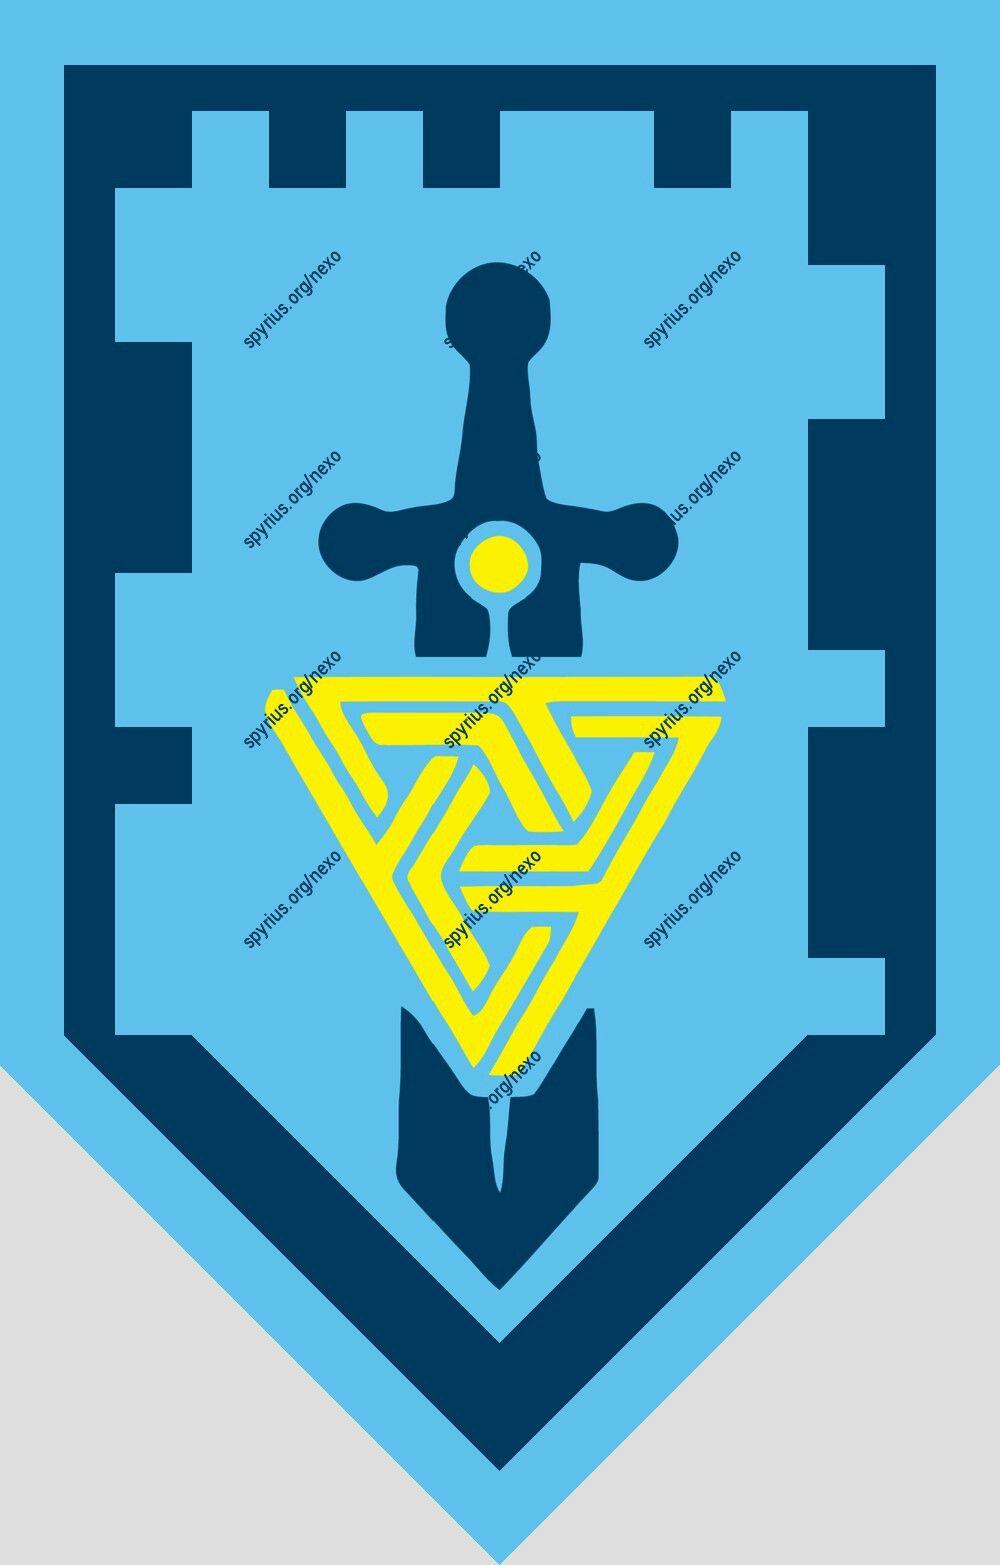 Fordito Knight Shield Nexo Knights Shields Lego Knights